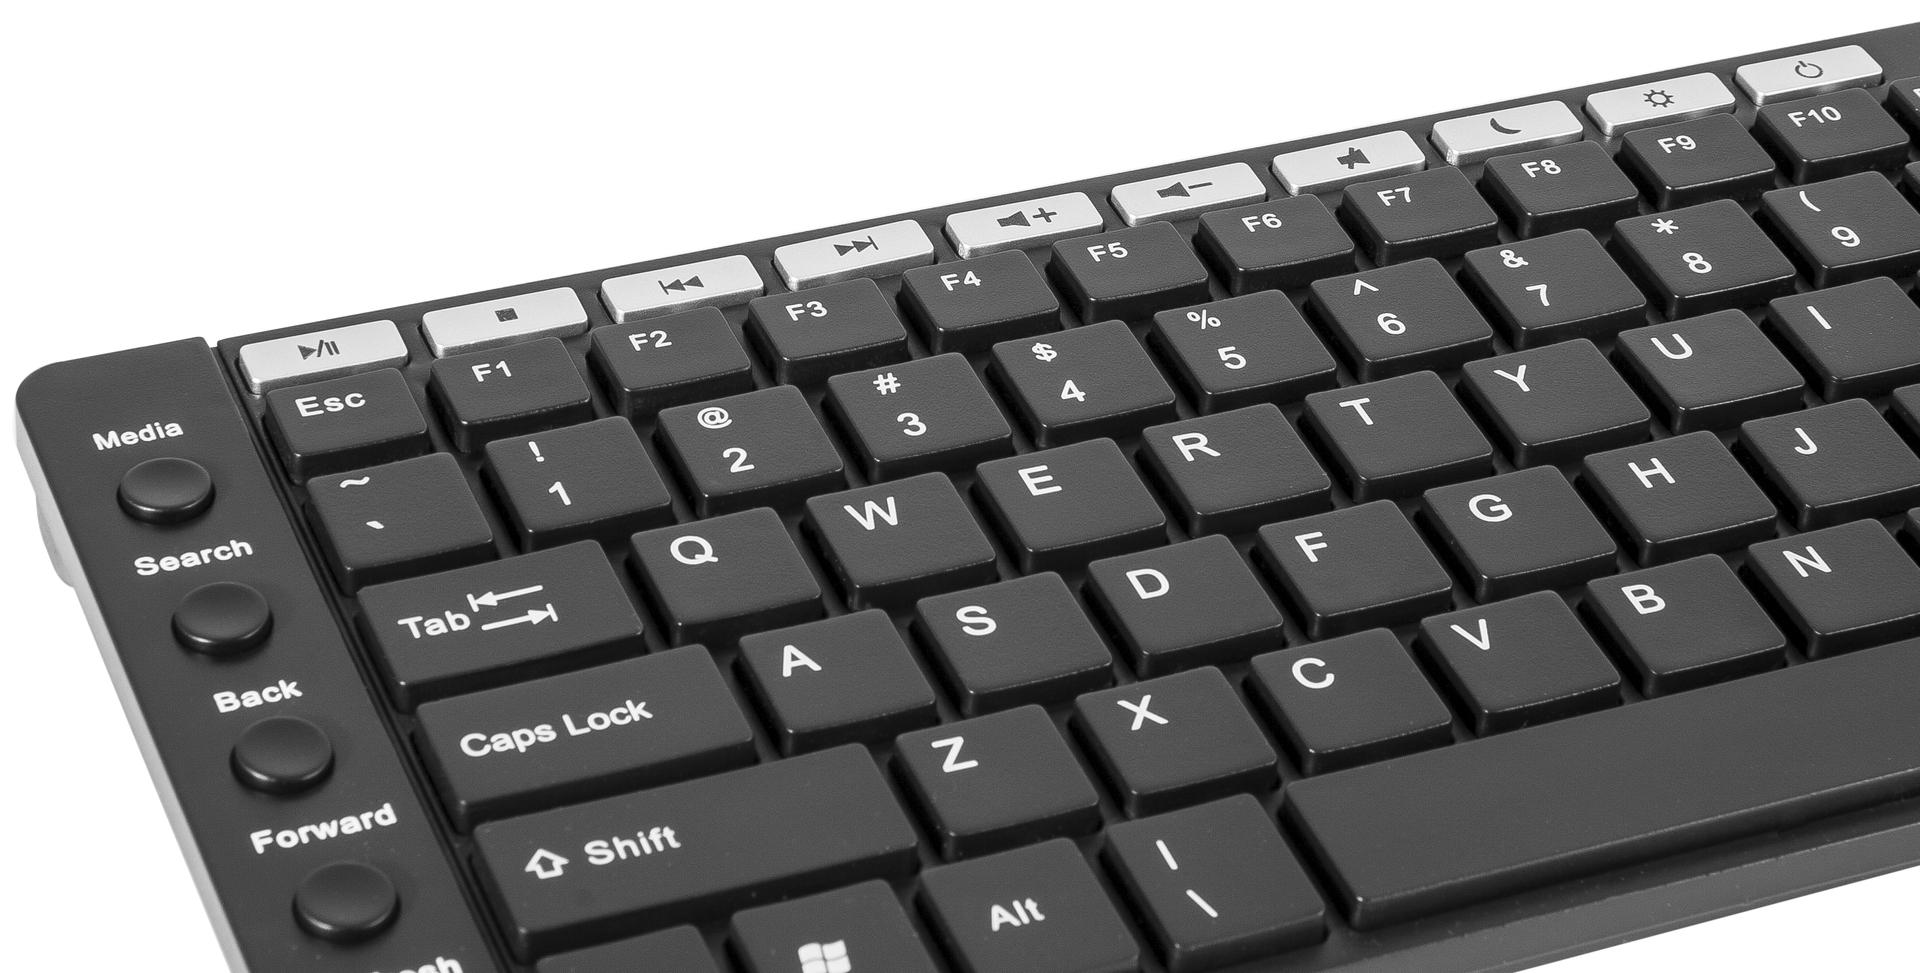 Клавиатура компьютер картинка